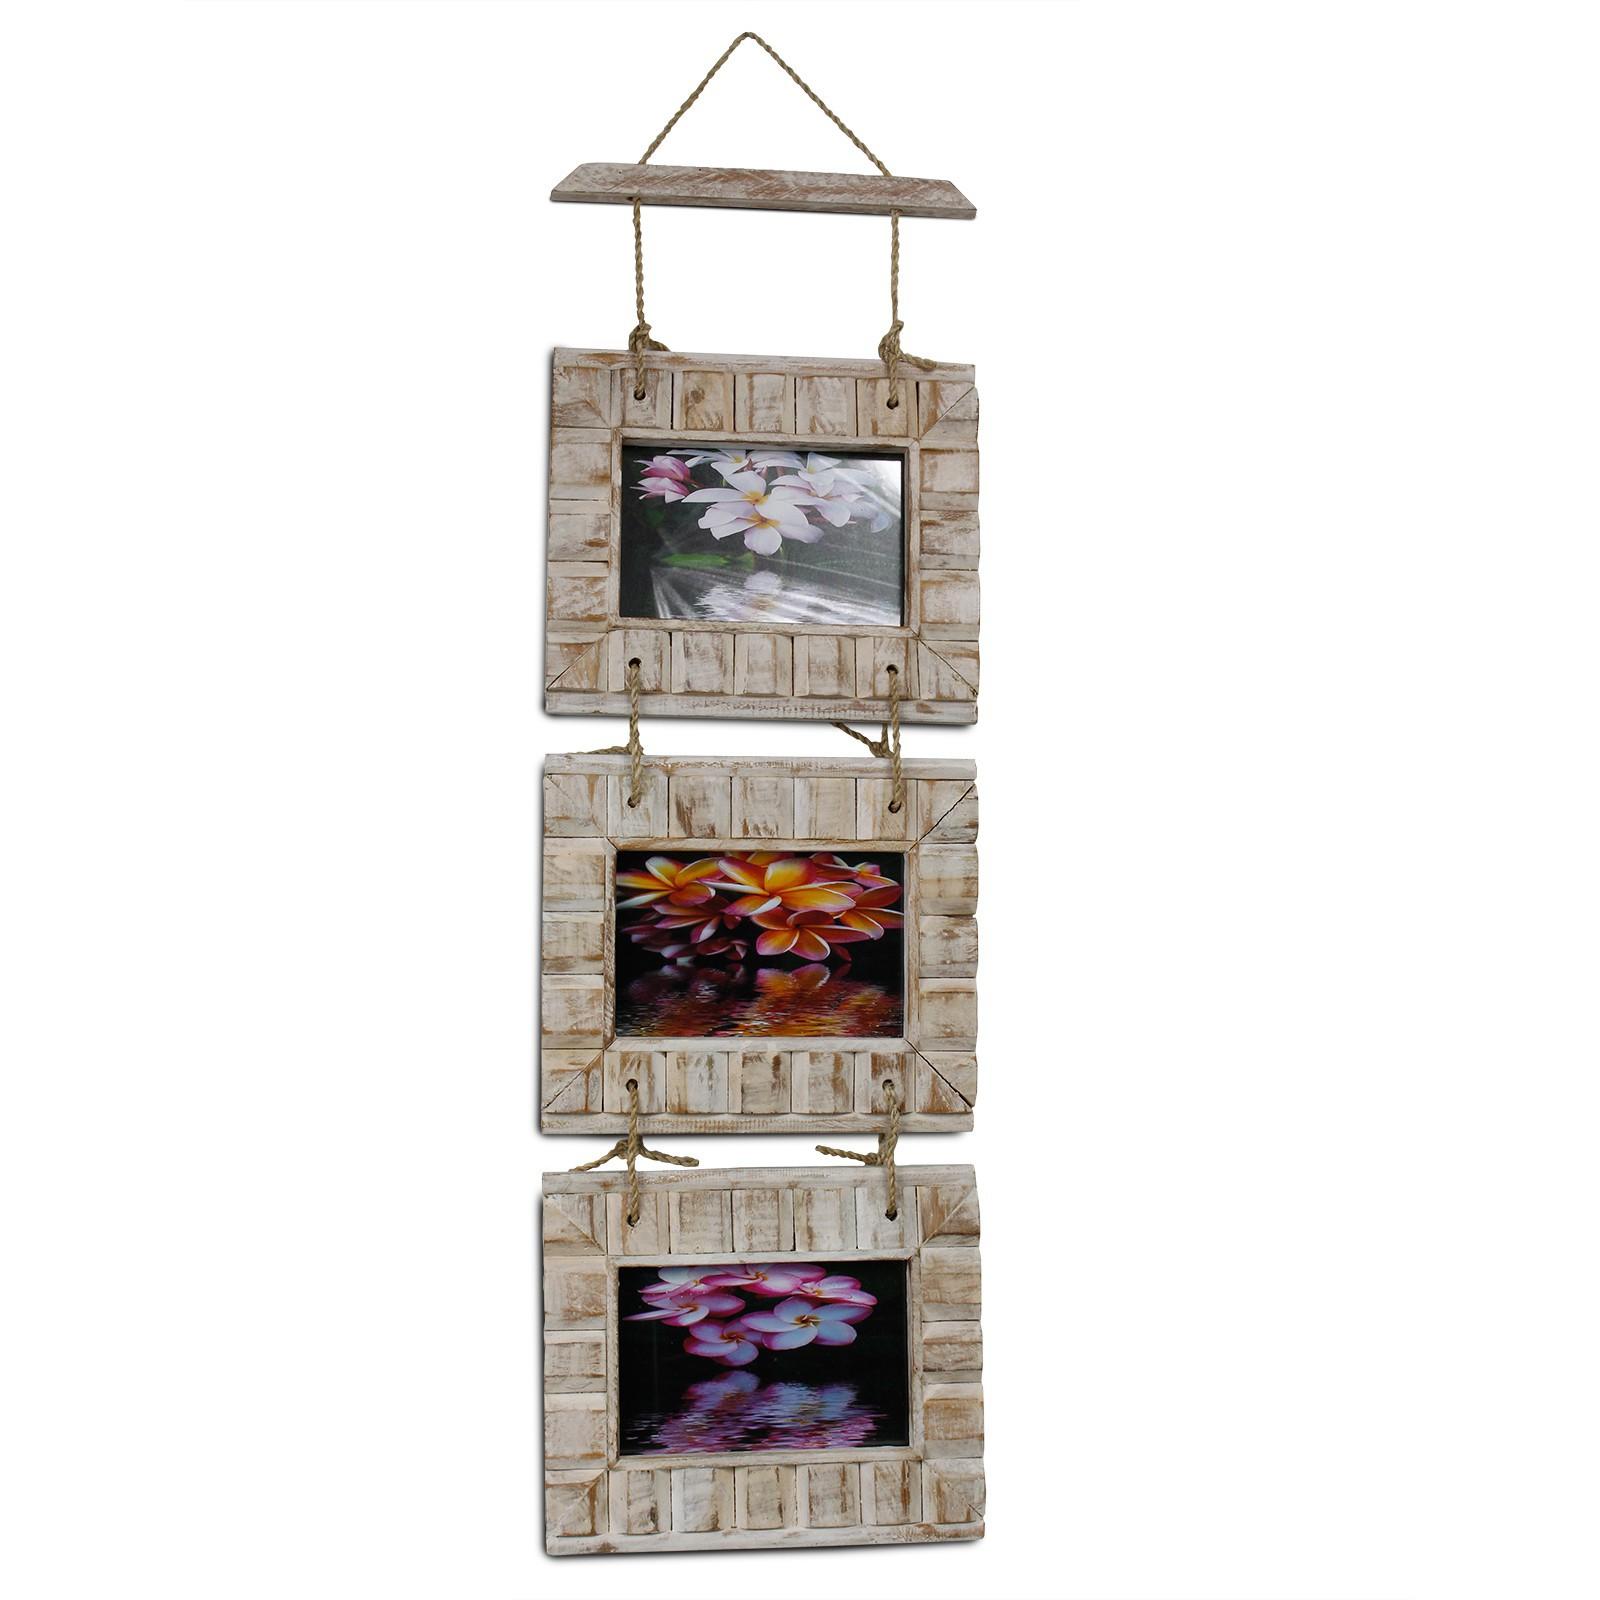 bilderrahmen fotorahmen collage 3er kette holz 10x15 rahmen bilderrahmen kette rustikal. Black Bedroom Furniture Sets. Home Design Ideas